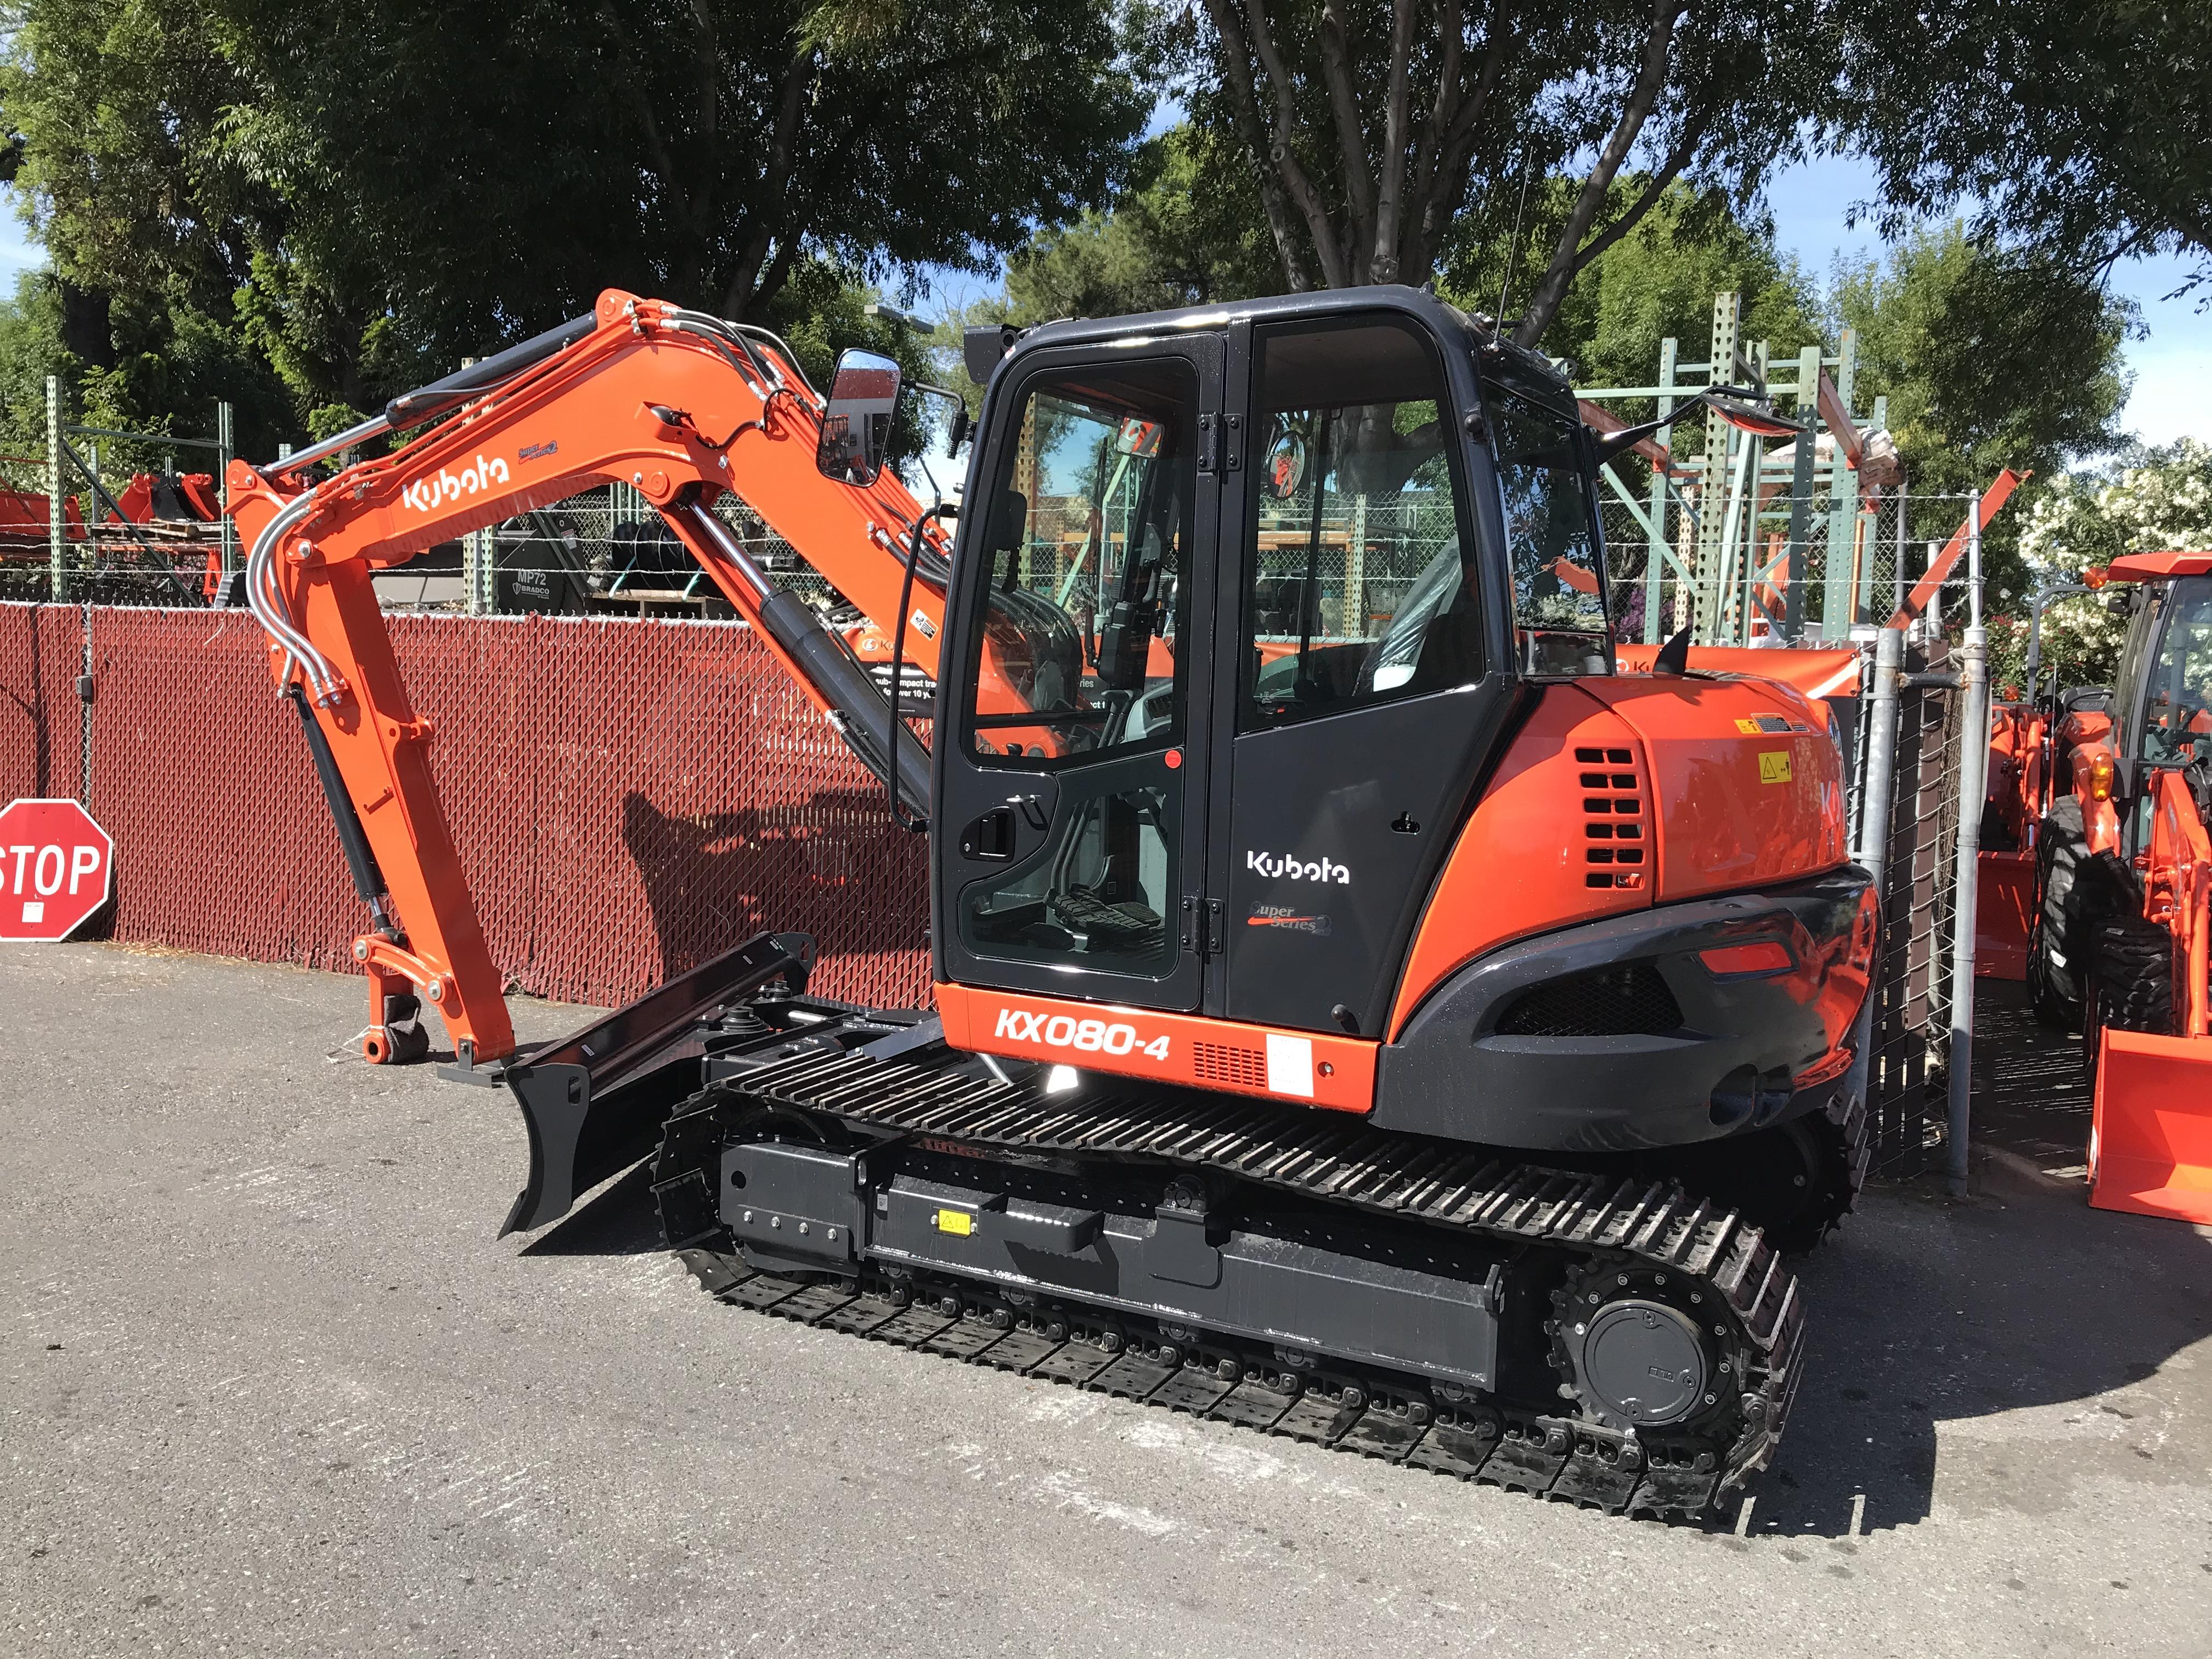 kx080 tractor